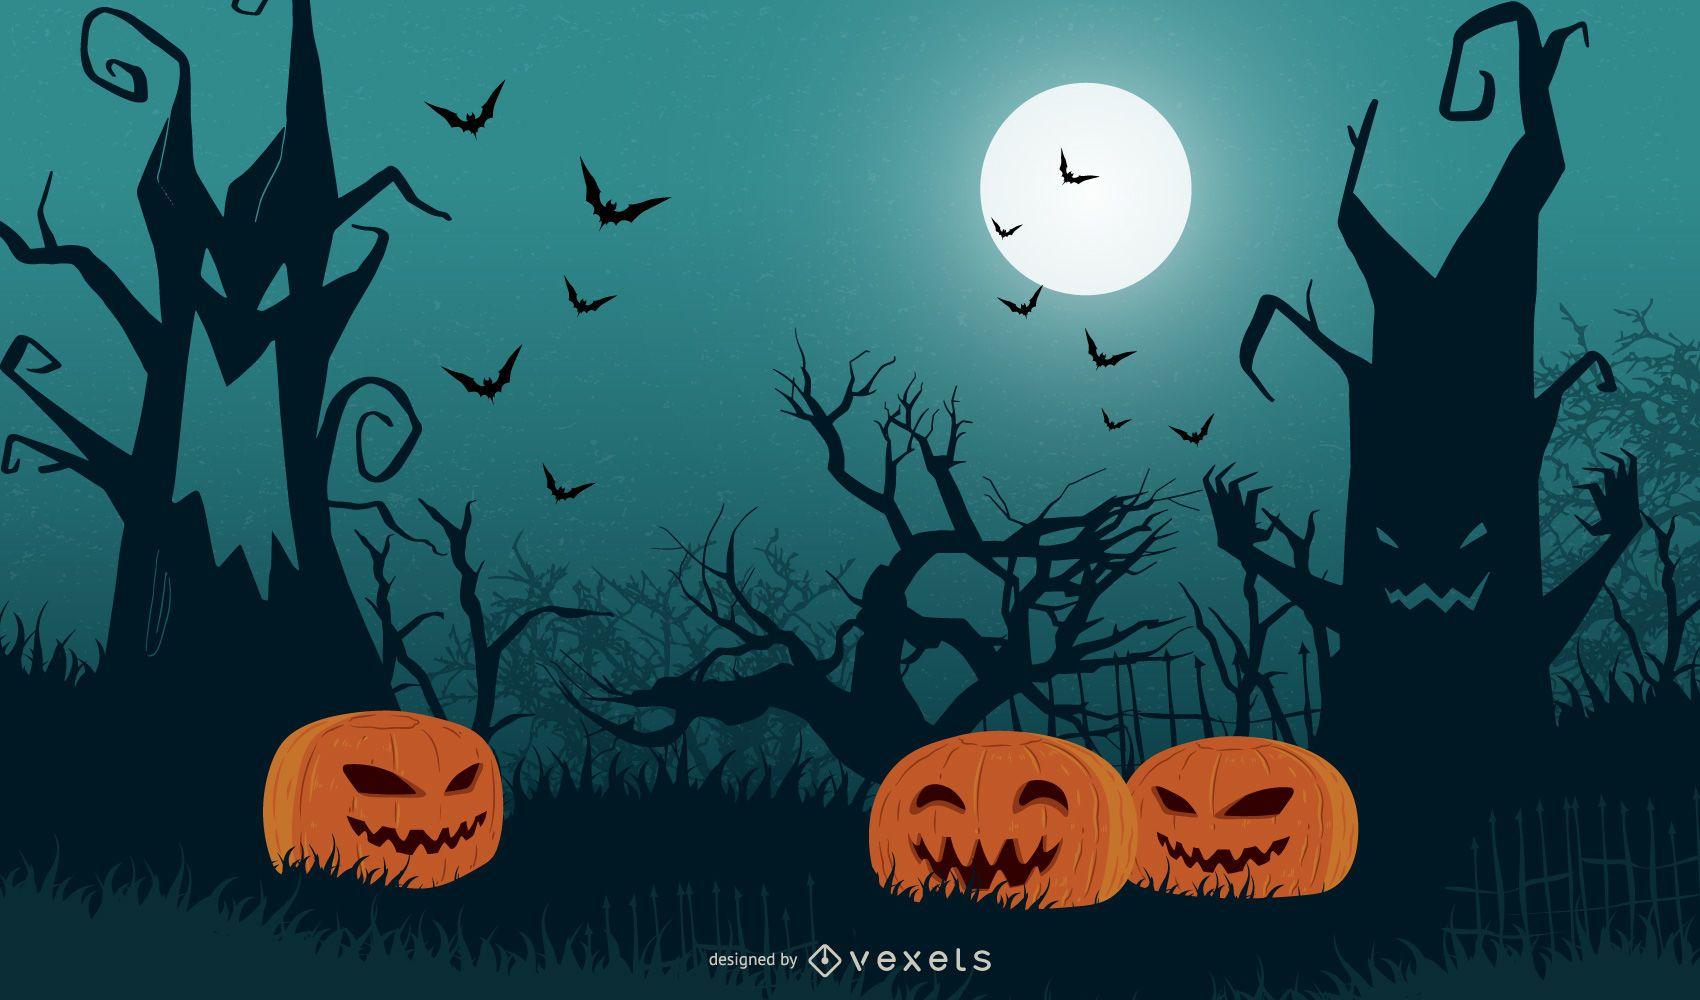 Árbol de Halloween con calabazas